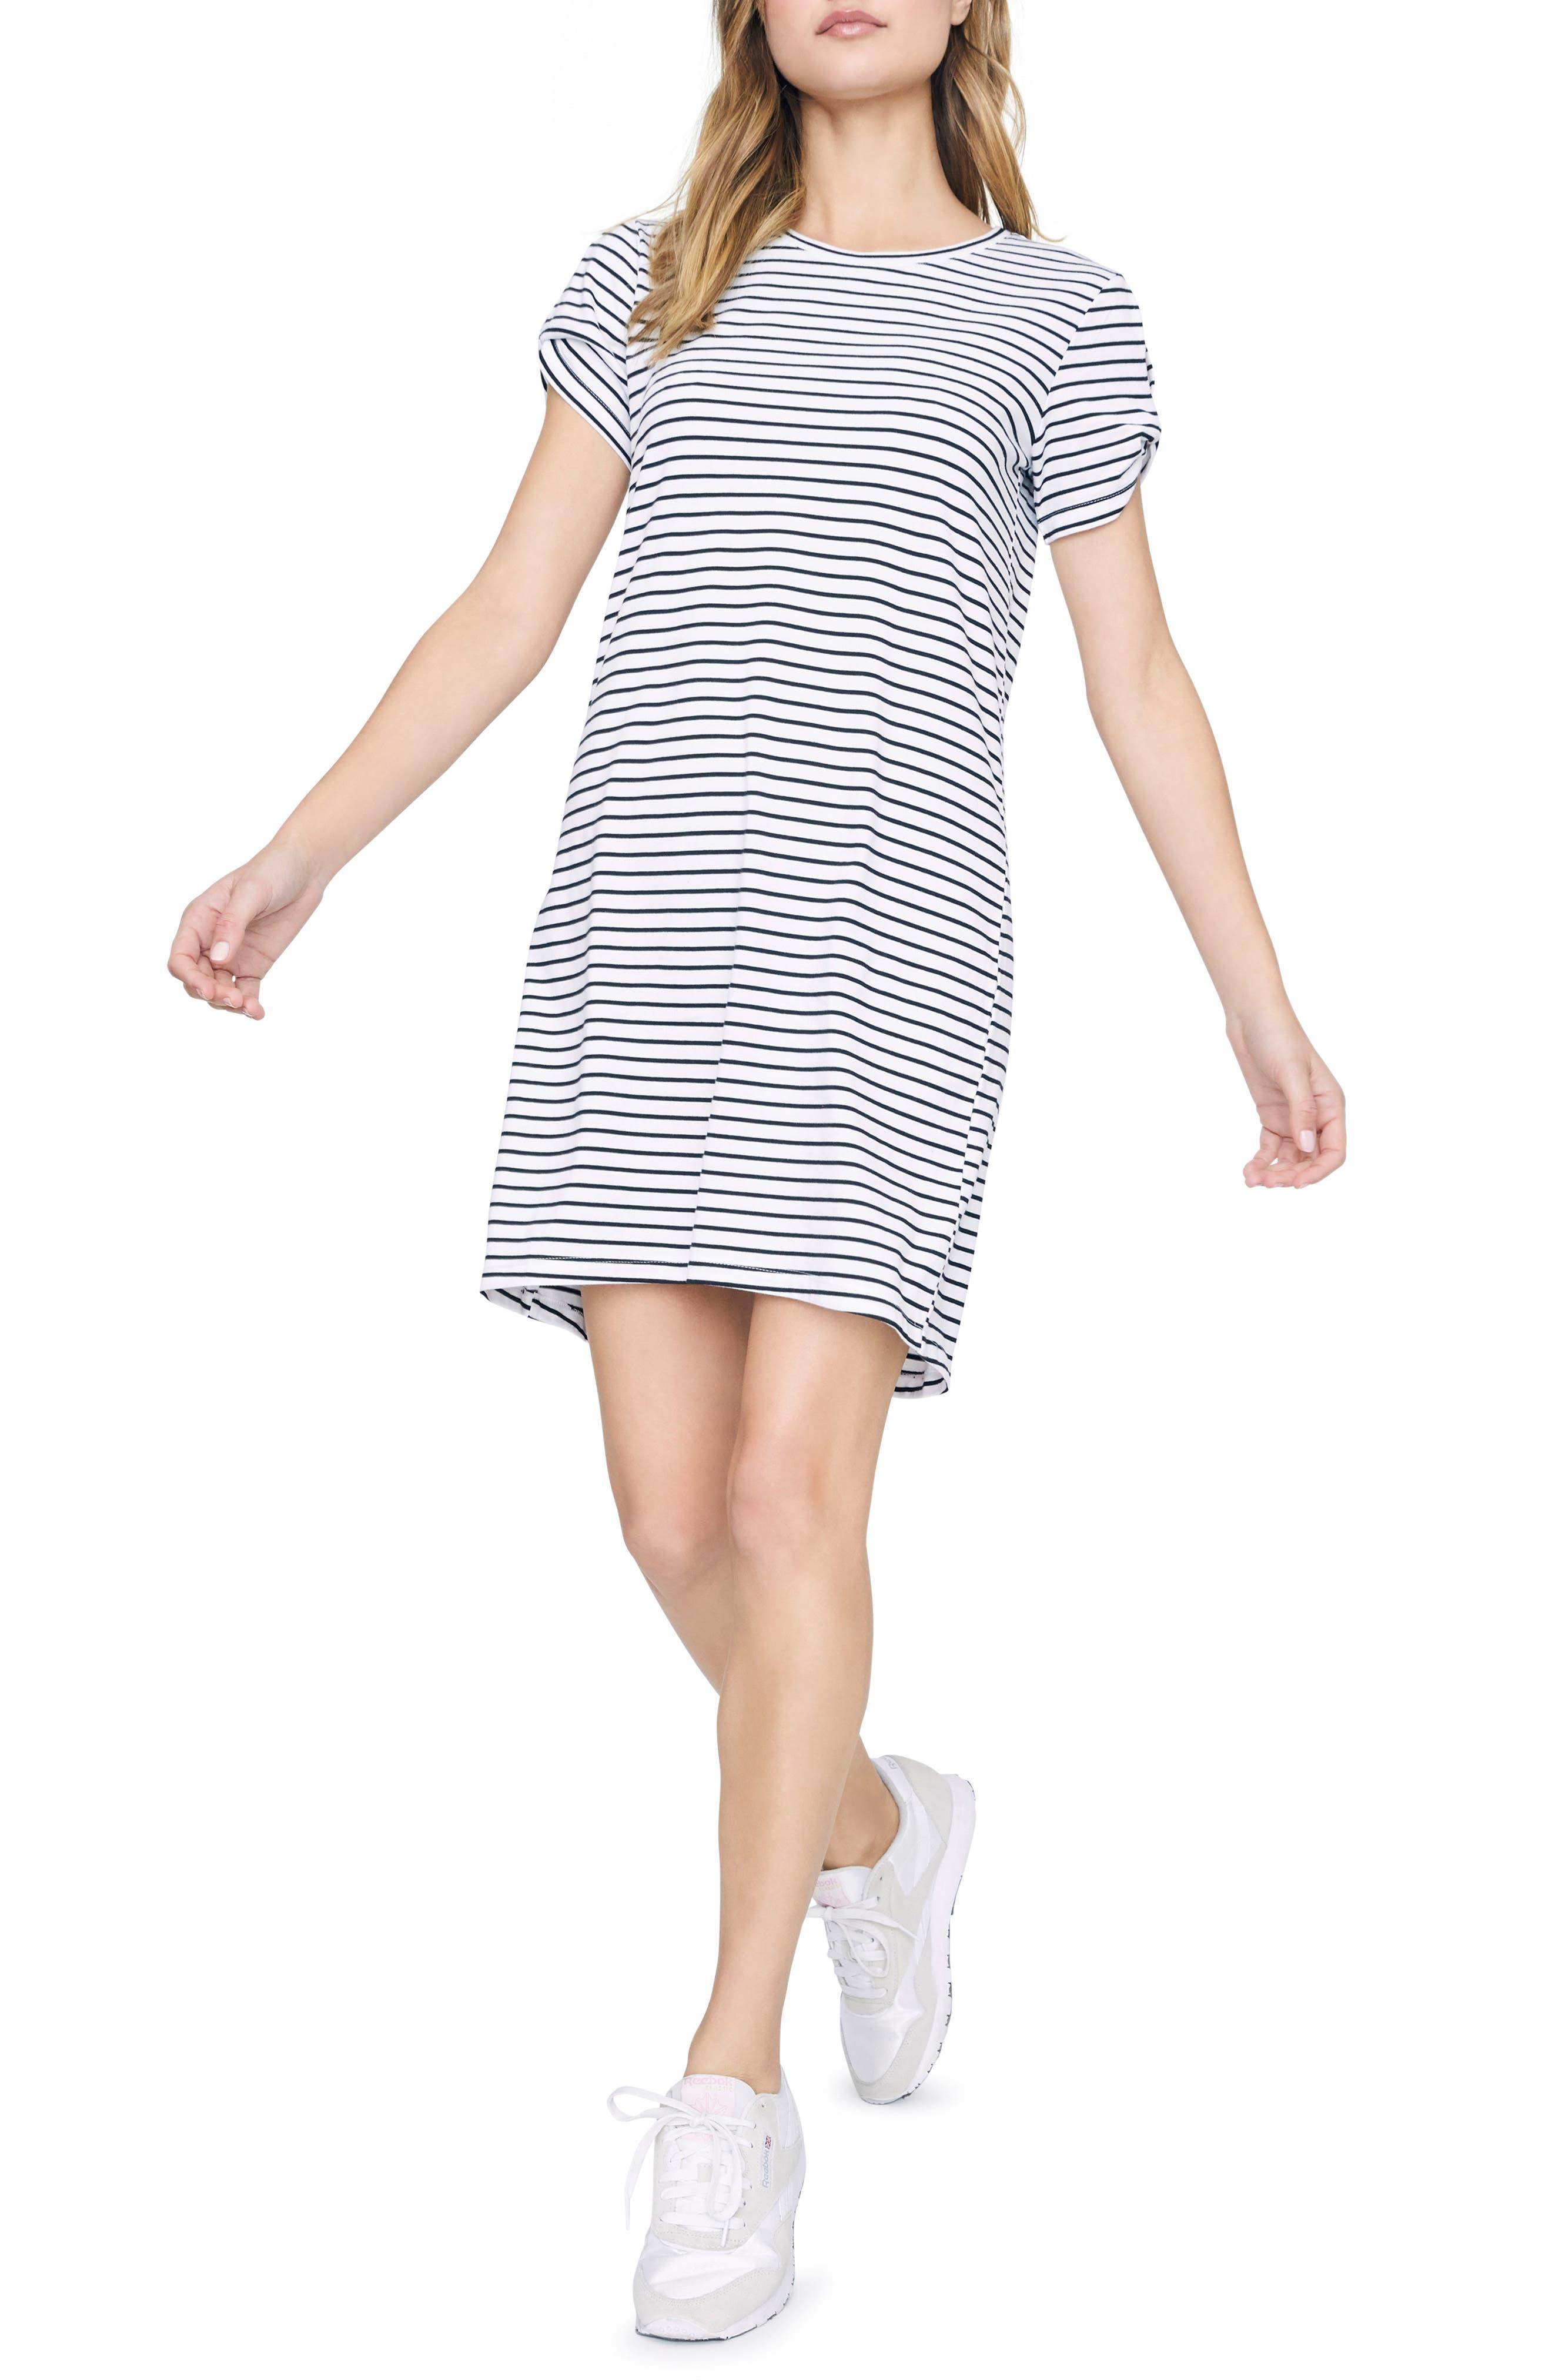 Sanctuary So Twisted Sleeve Detail Cotton Blend T-Shirt Dress